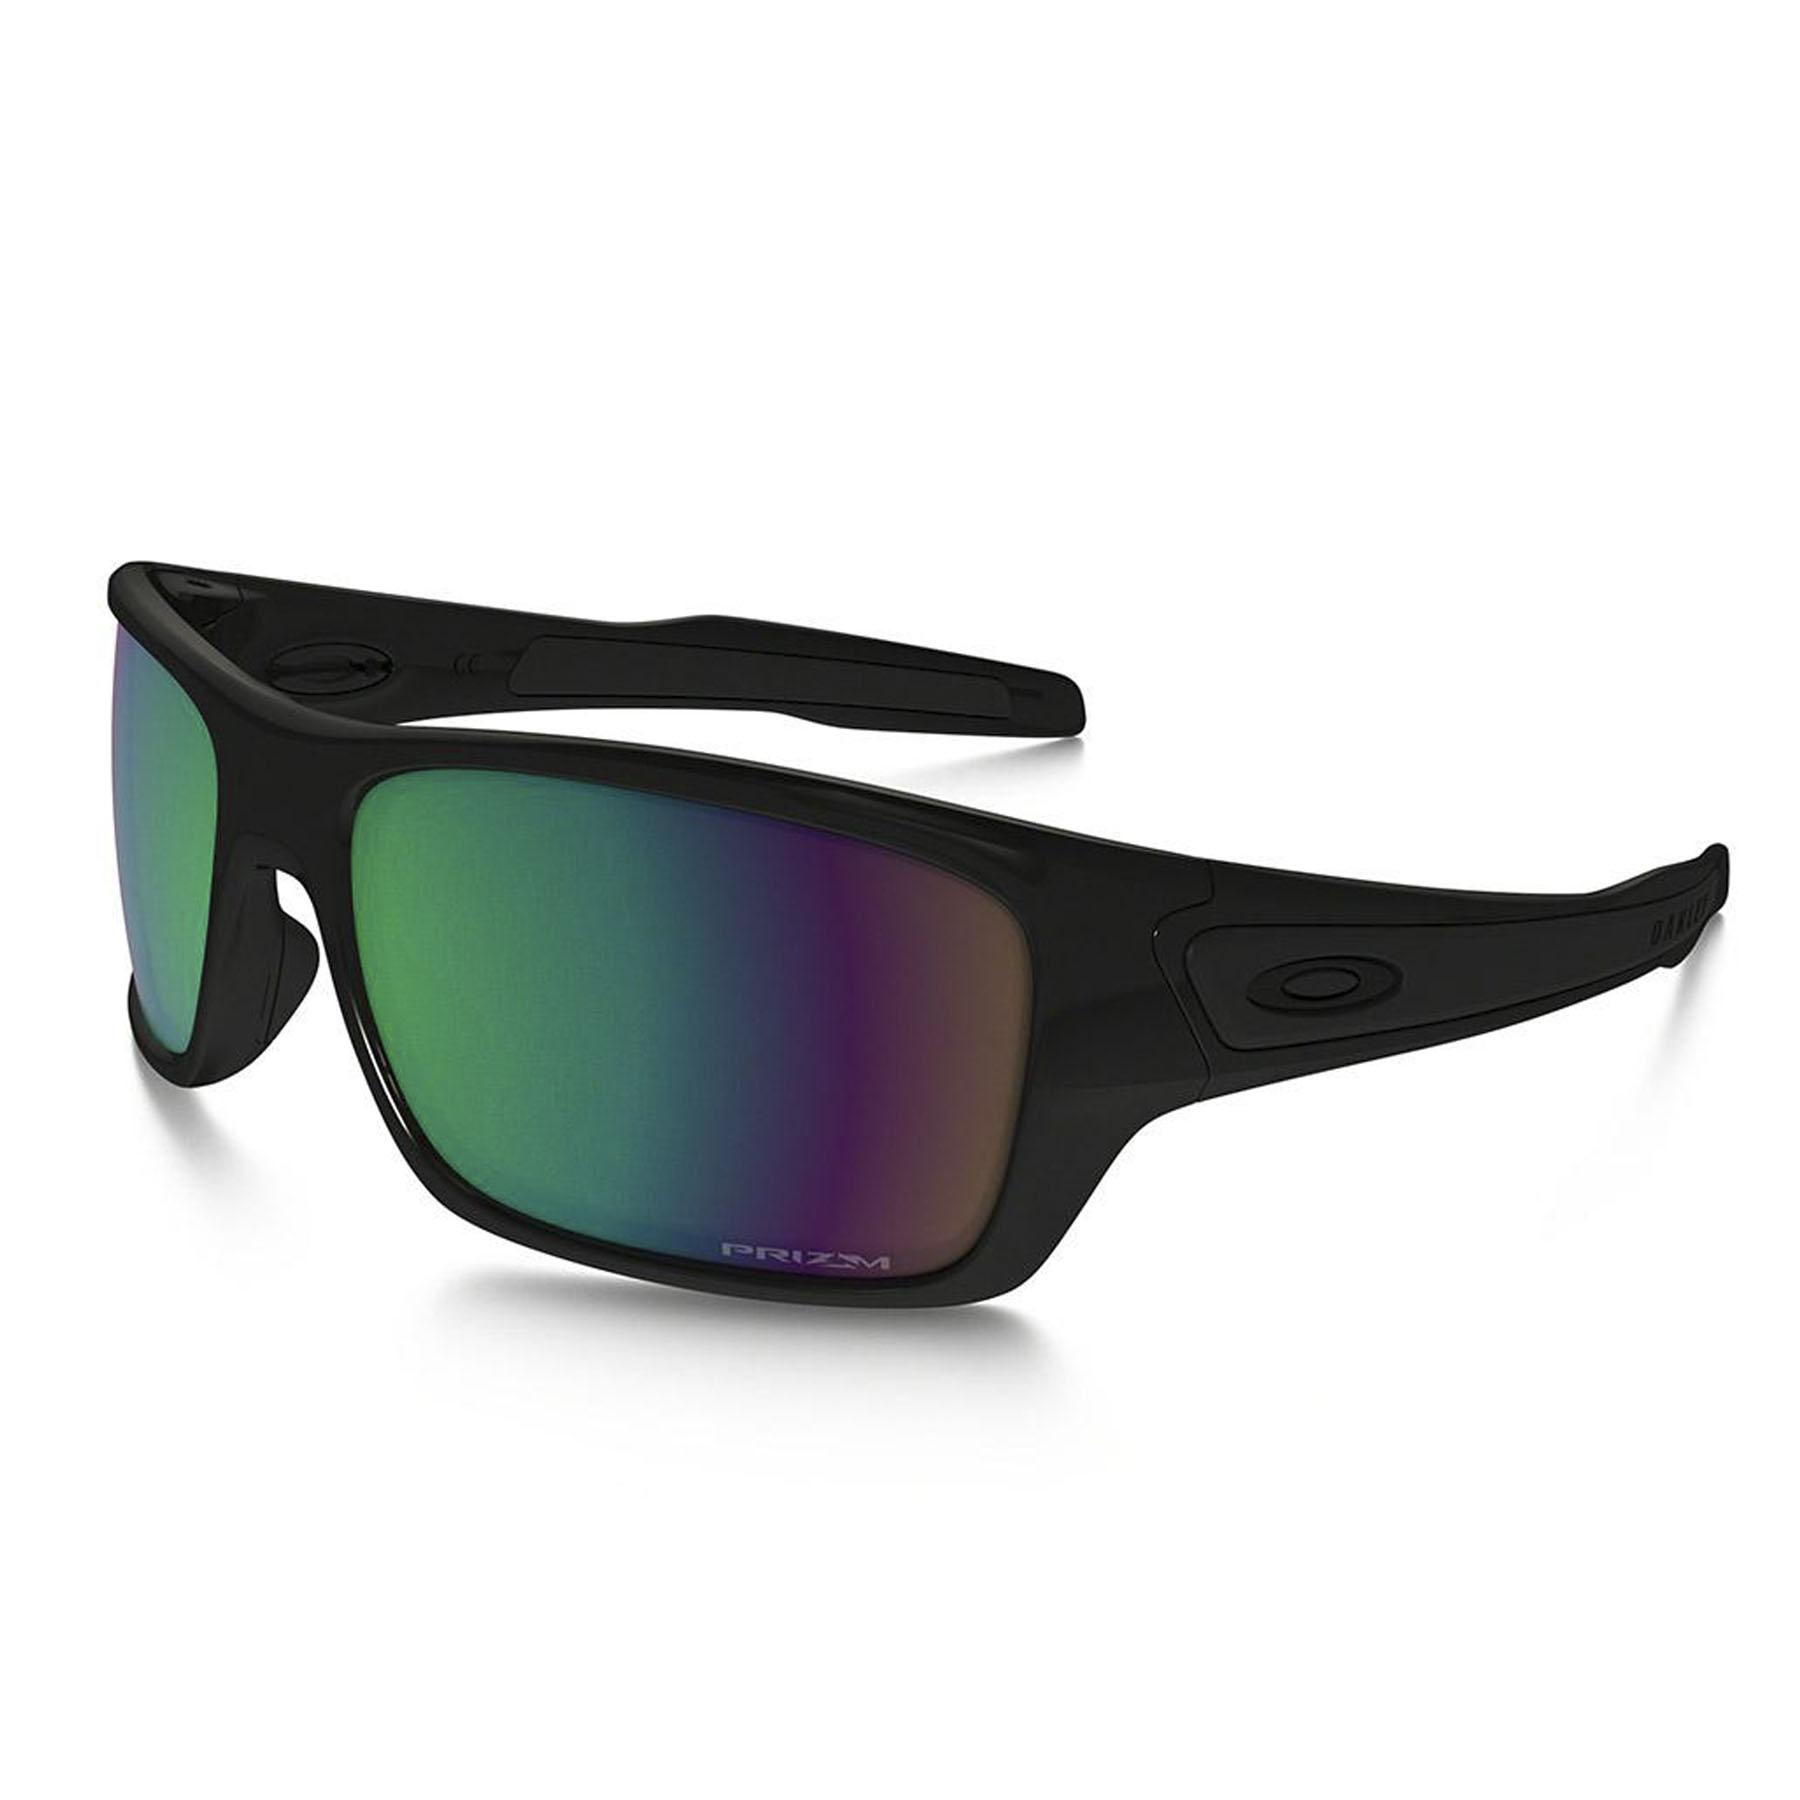 54d593450f Oakley Turbine PRIZM Shallow Water Polarized Sunglasses